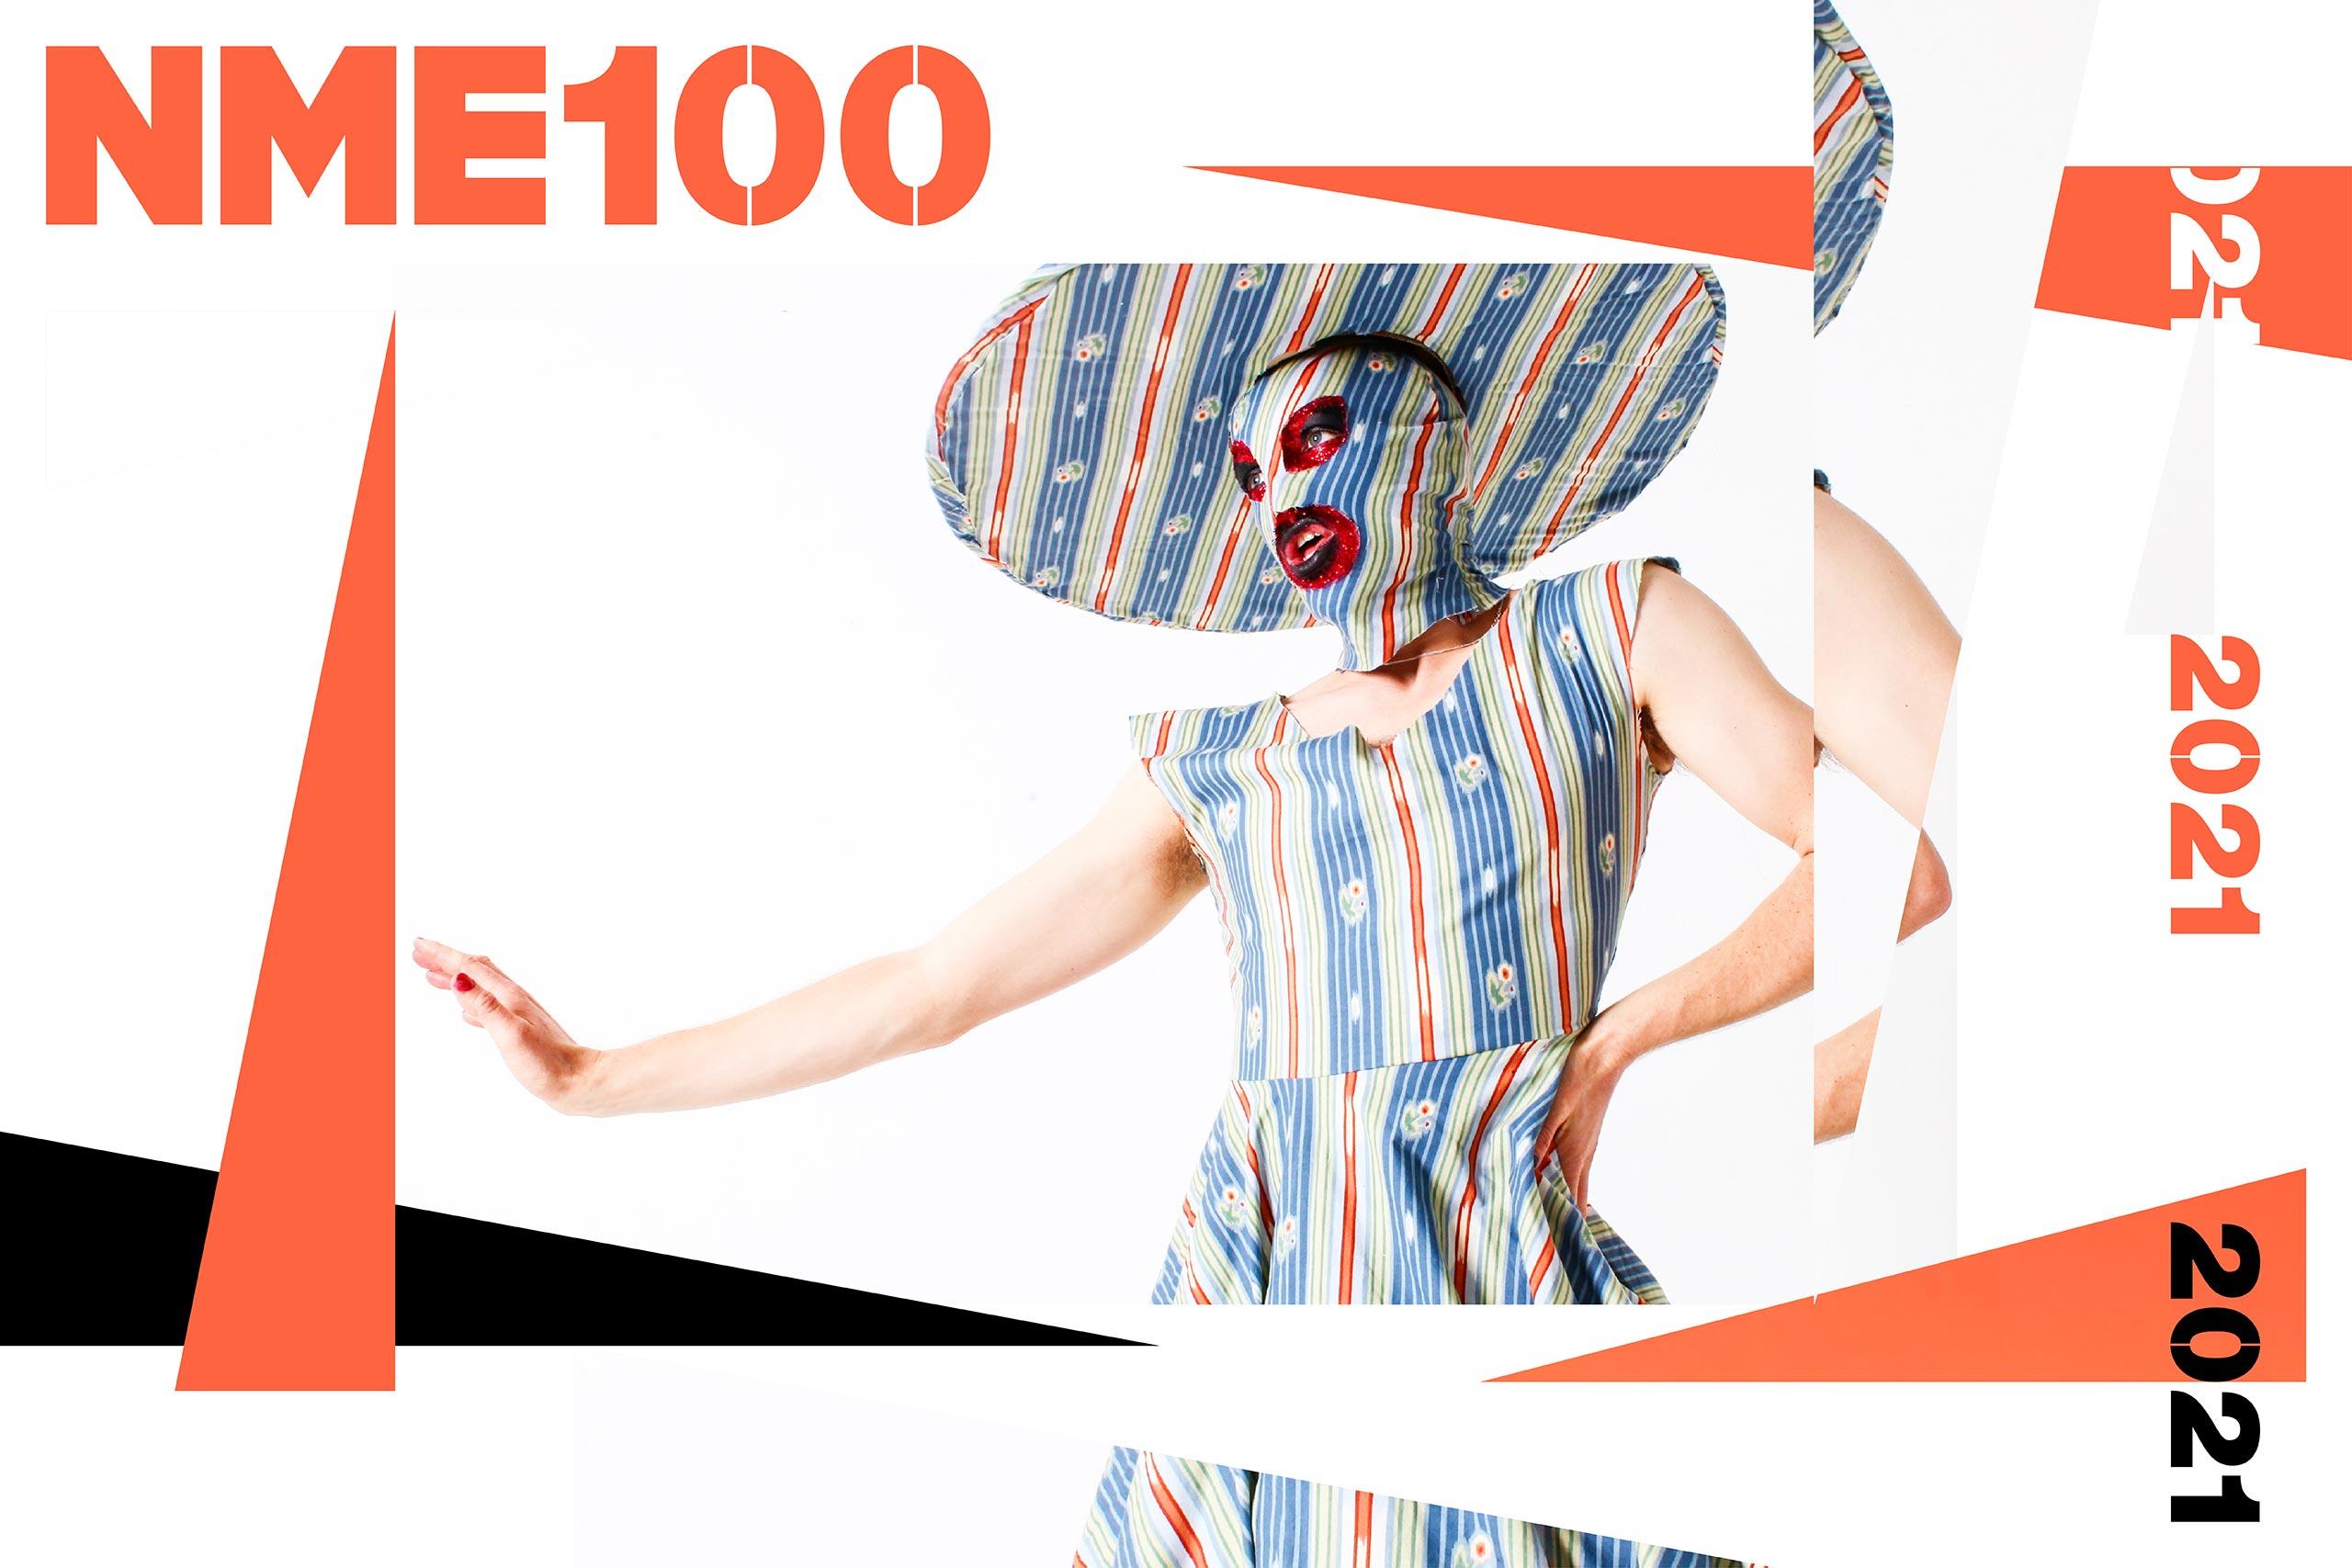 NME 100 lynks